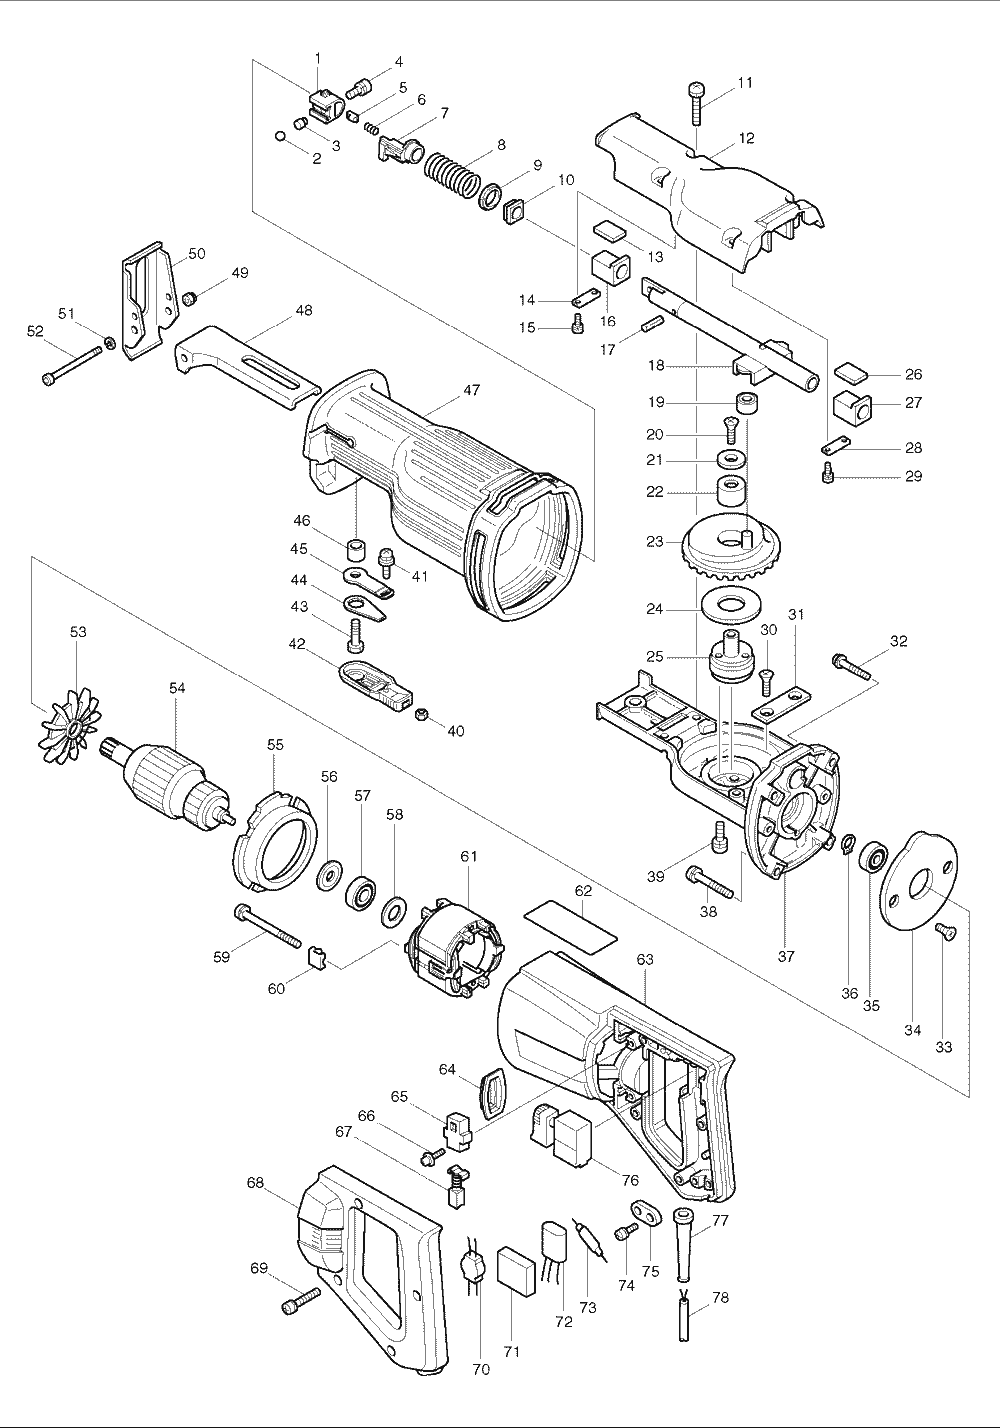 Buy Makita JR3000VT Reciprocating Replacement Tool Parts